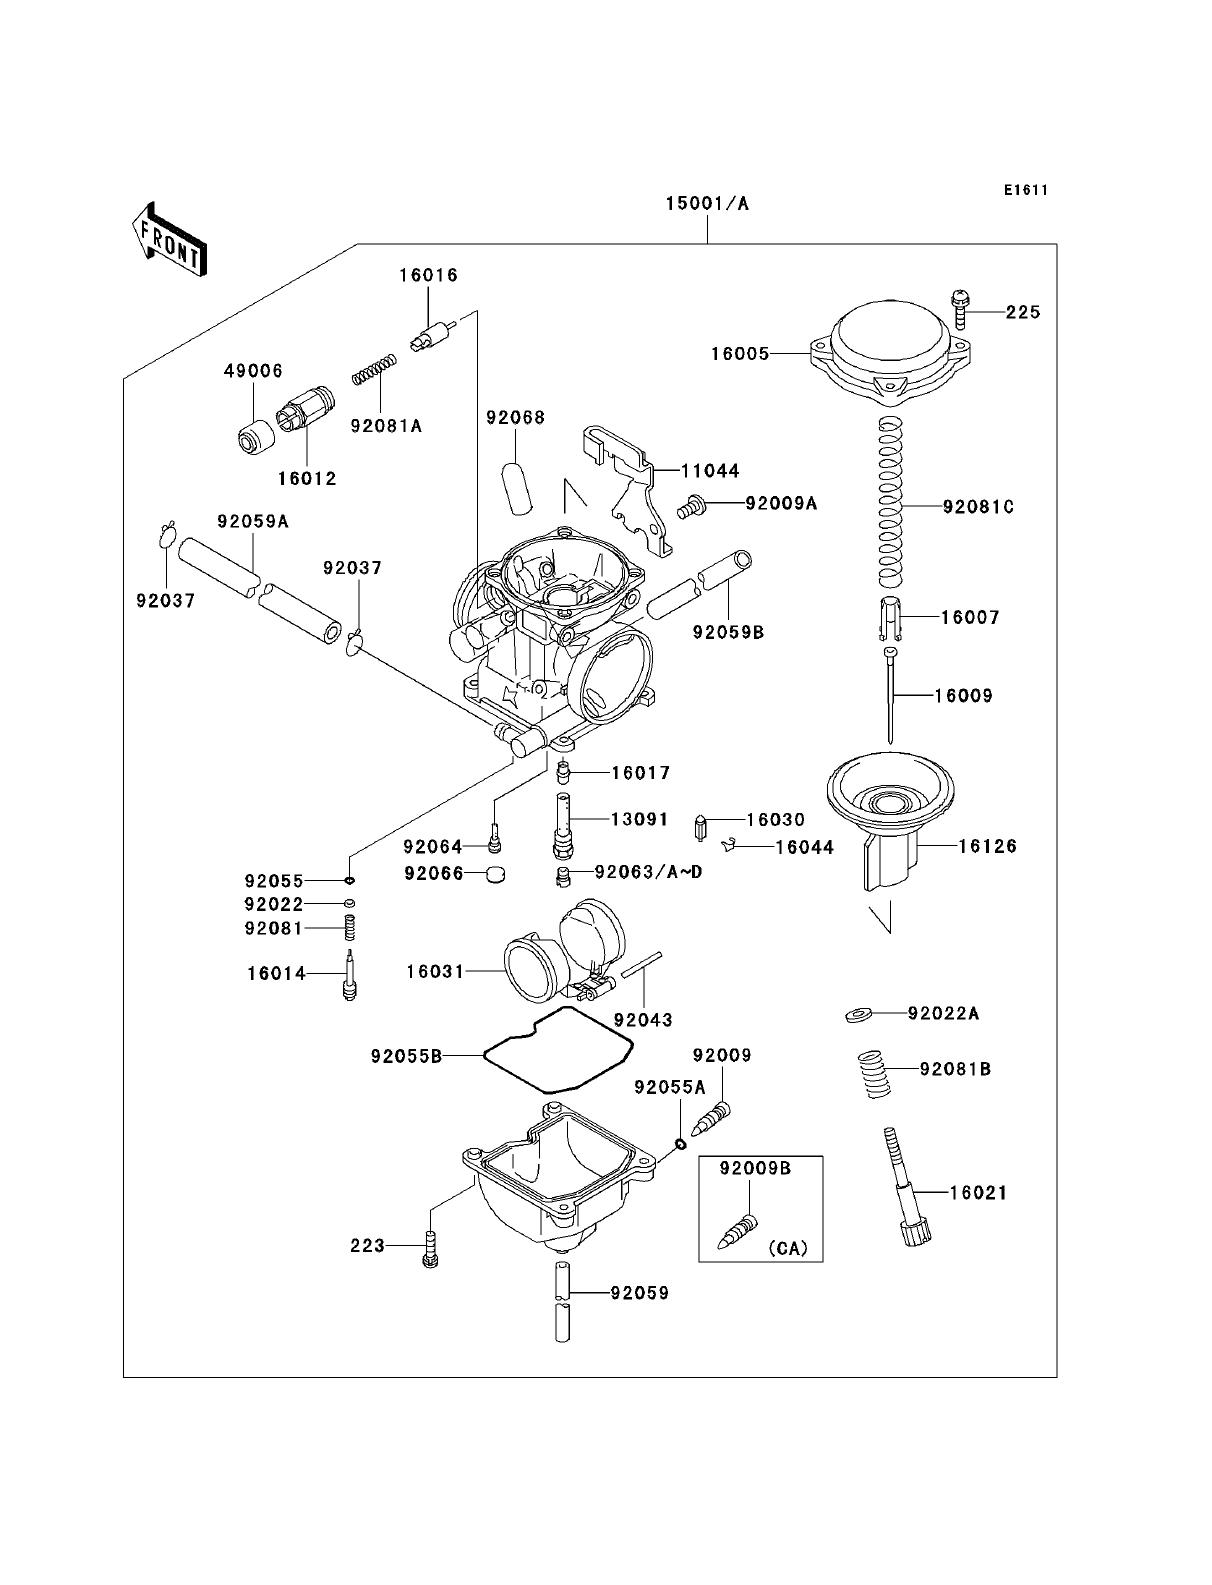 klr250_parts_diagram_carburetor?resize=665%2C870 2005 klr 650 wiring diagram the best wiring diagram 2017 2016 klr650 wiring diagram at panicattacktreatment.co